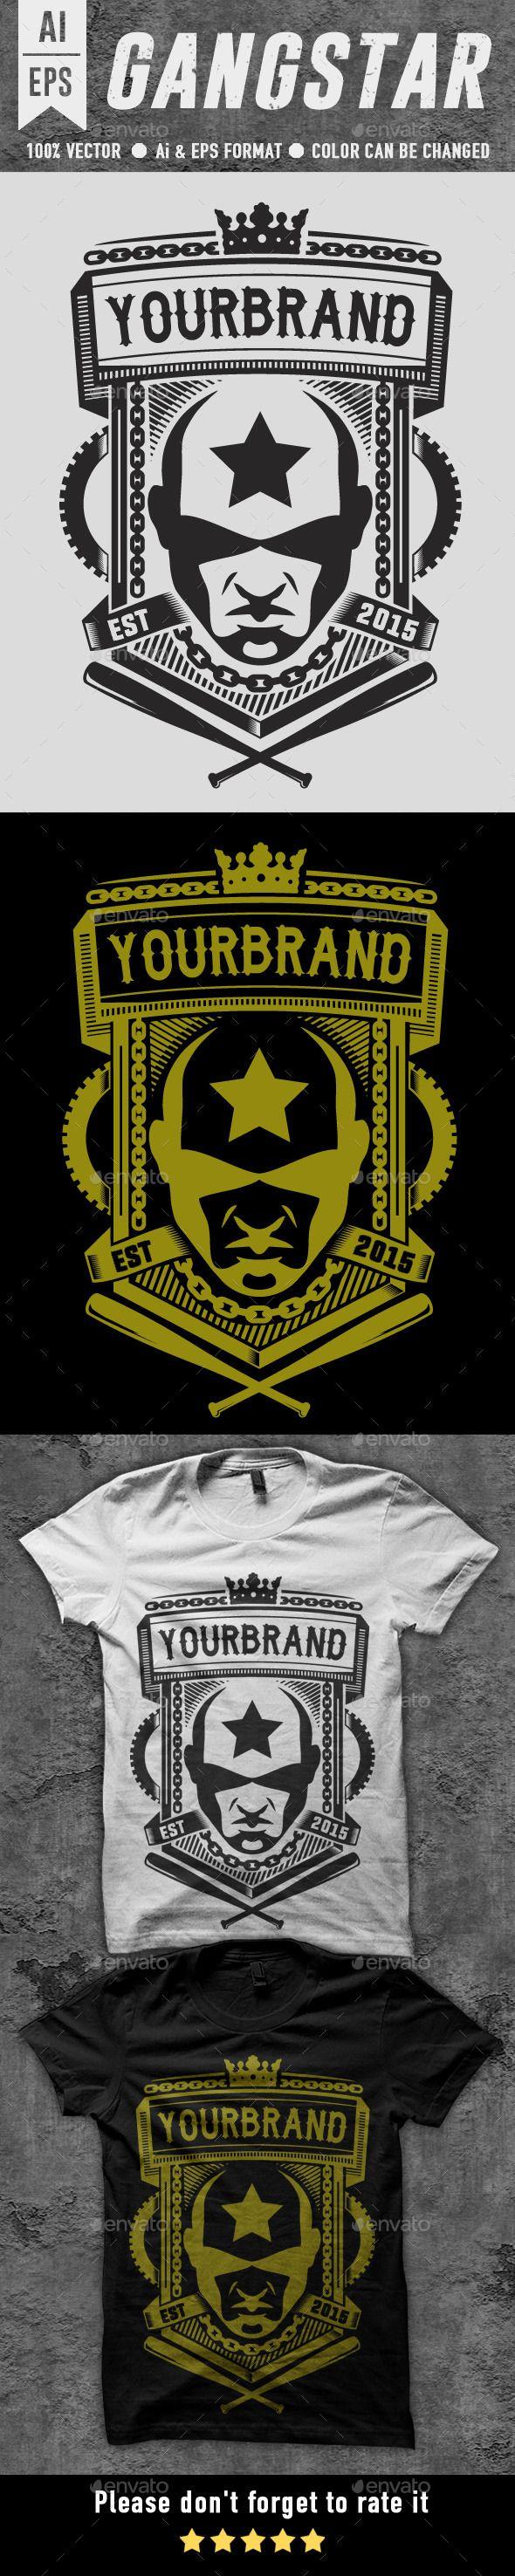 Gangstar Tshirt Design Template Download http